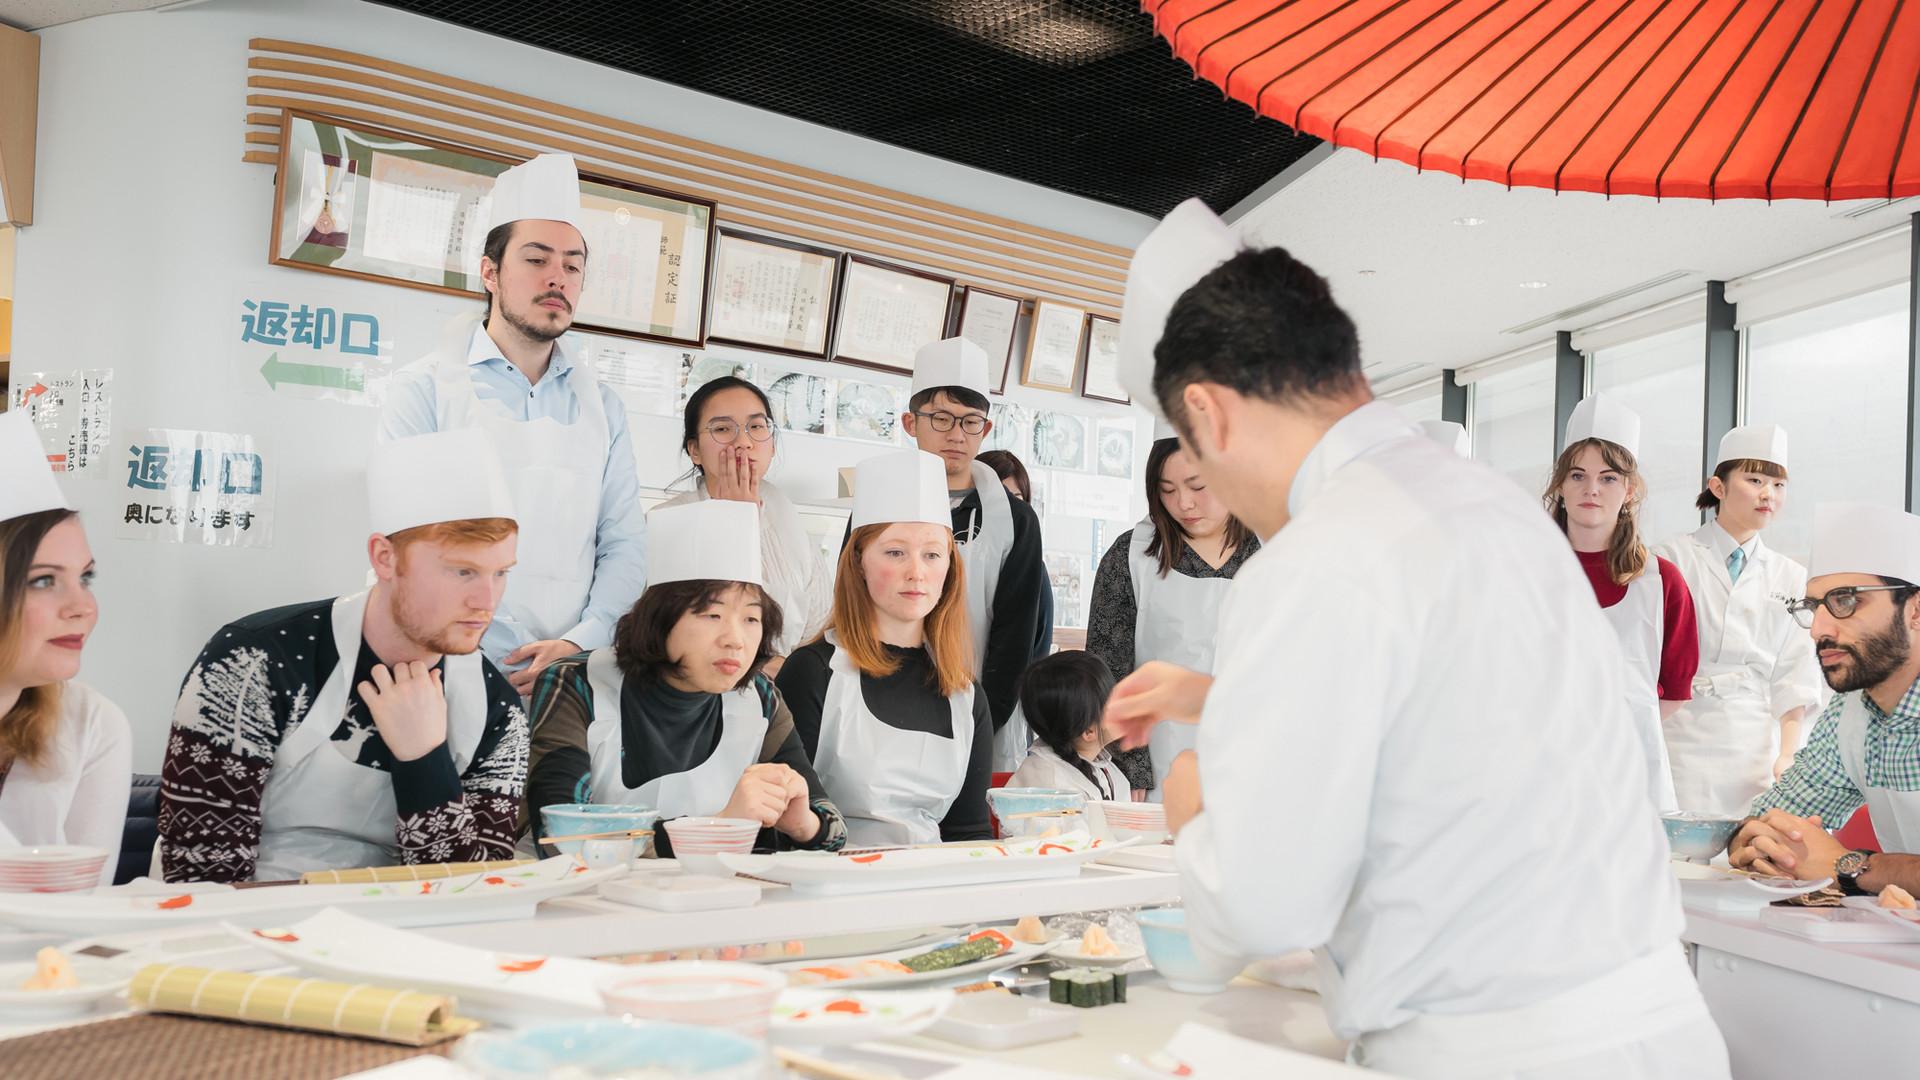 Students watching Chef Suda teach nigiri sushi tecniques.